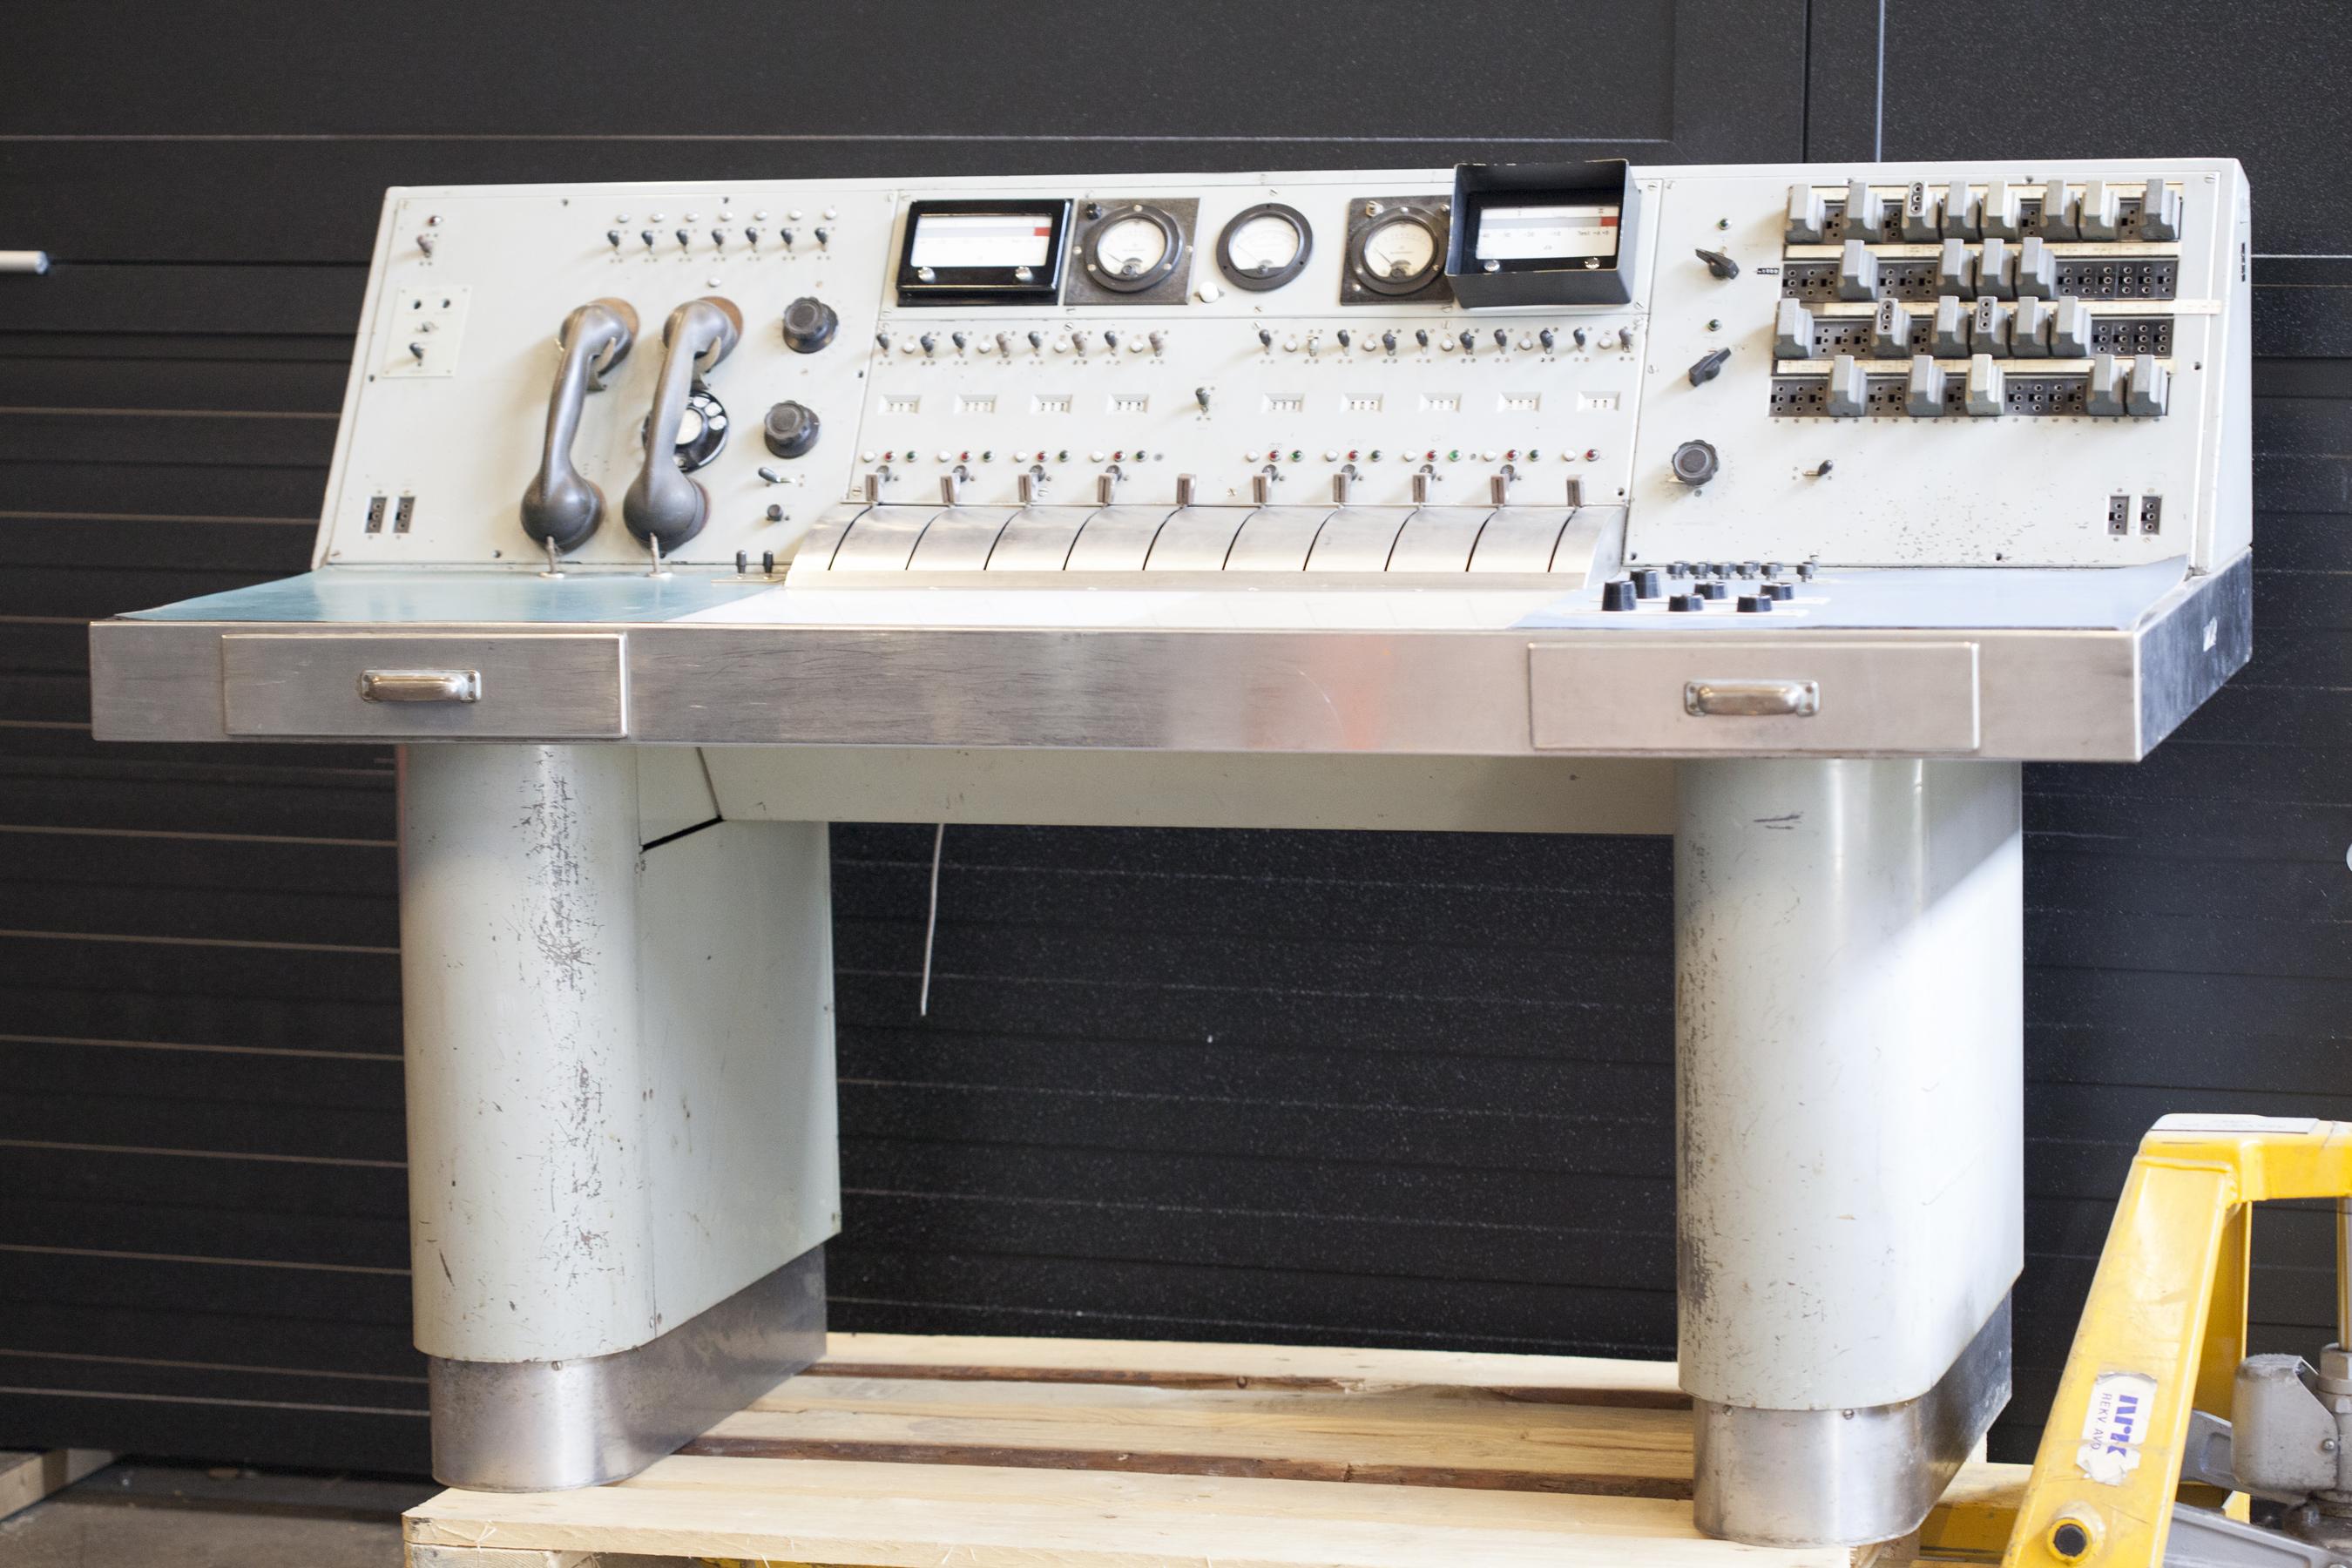 Mikrofon Norsk Teknisk Museum DigitaltMuseum